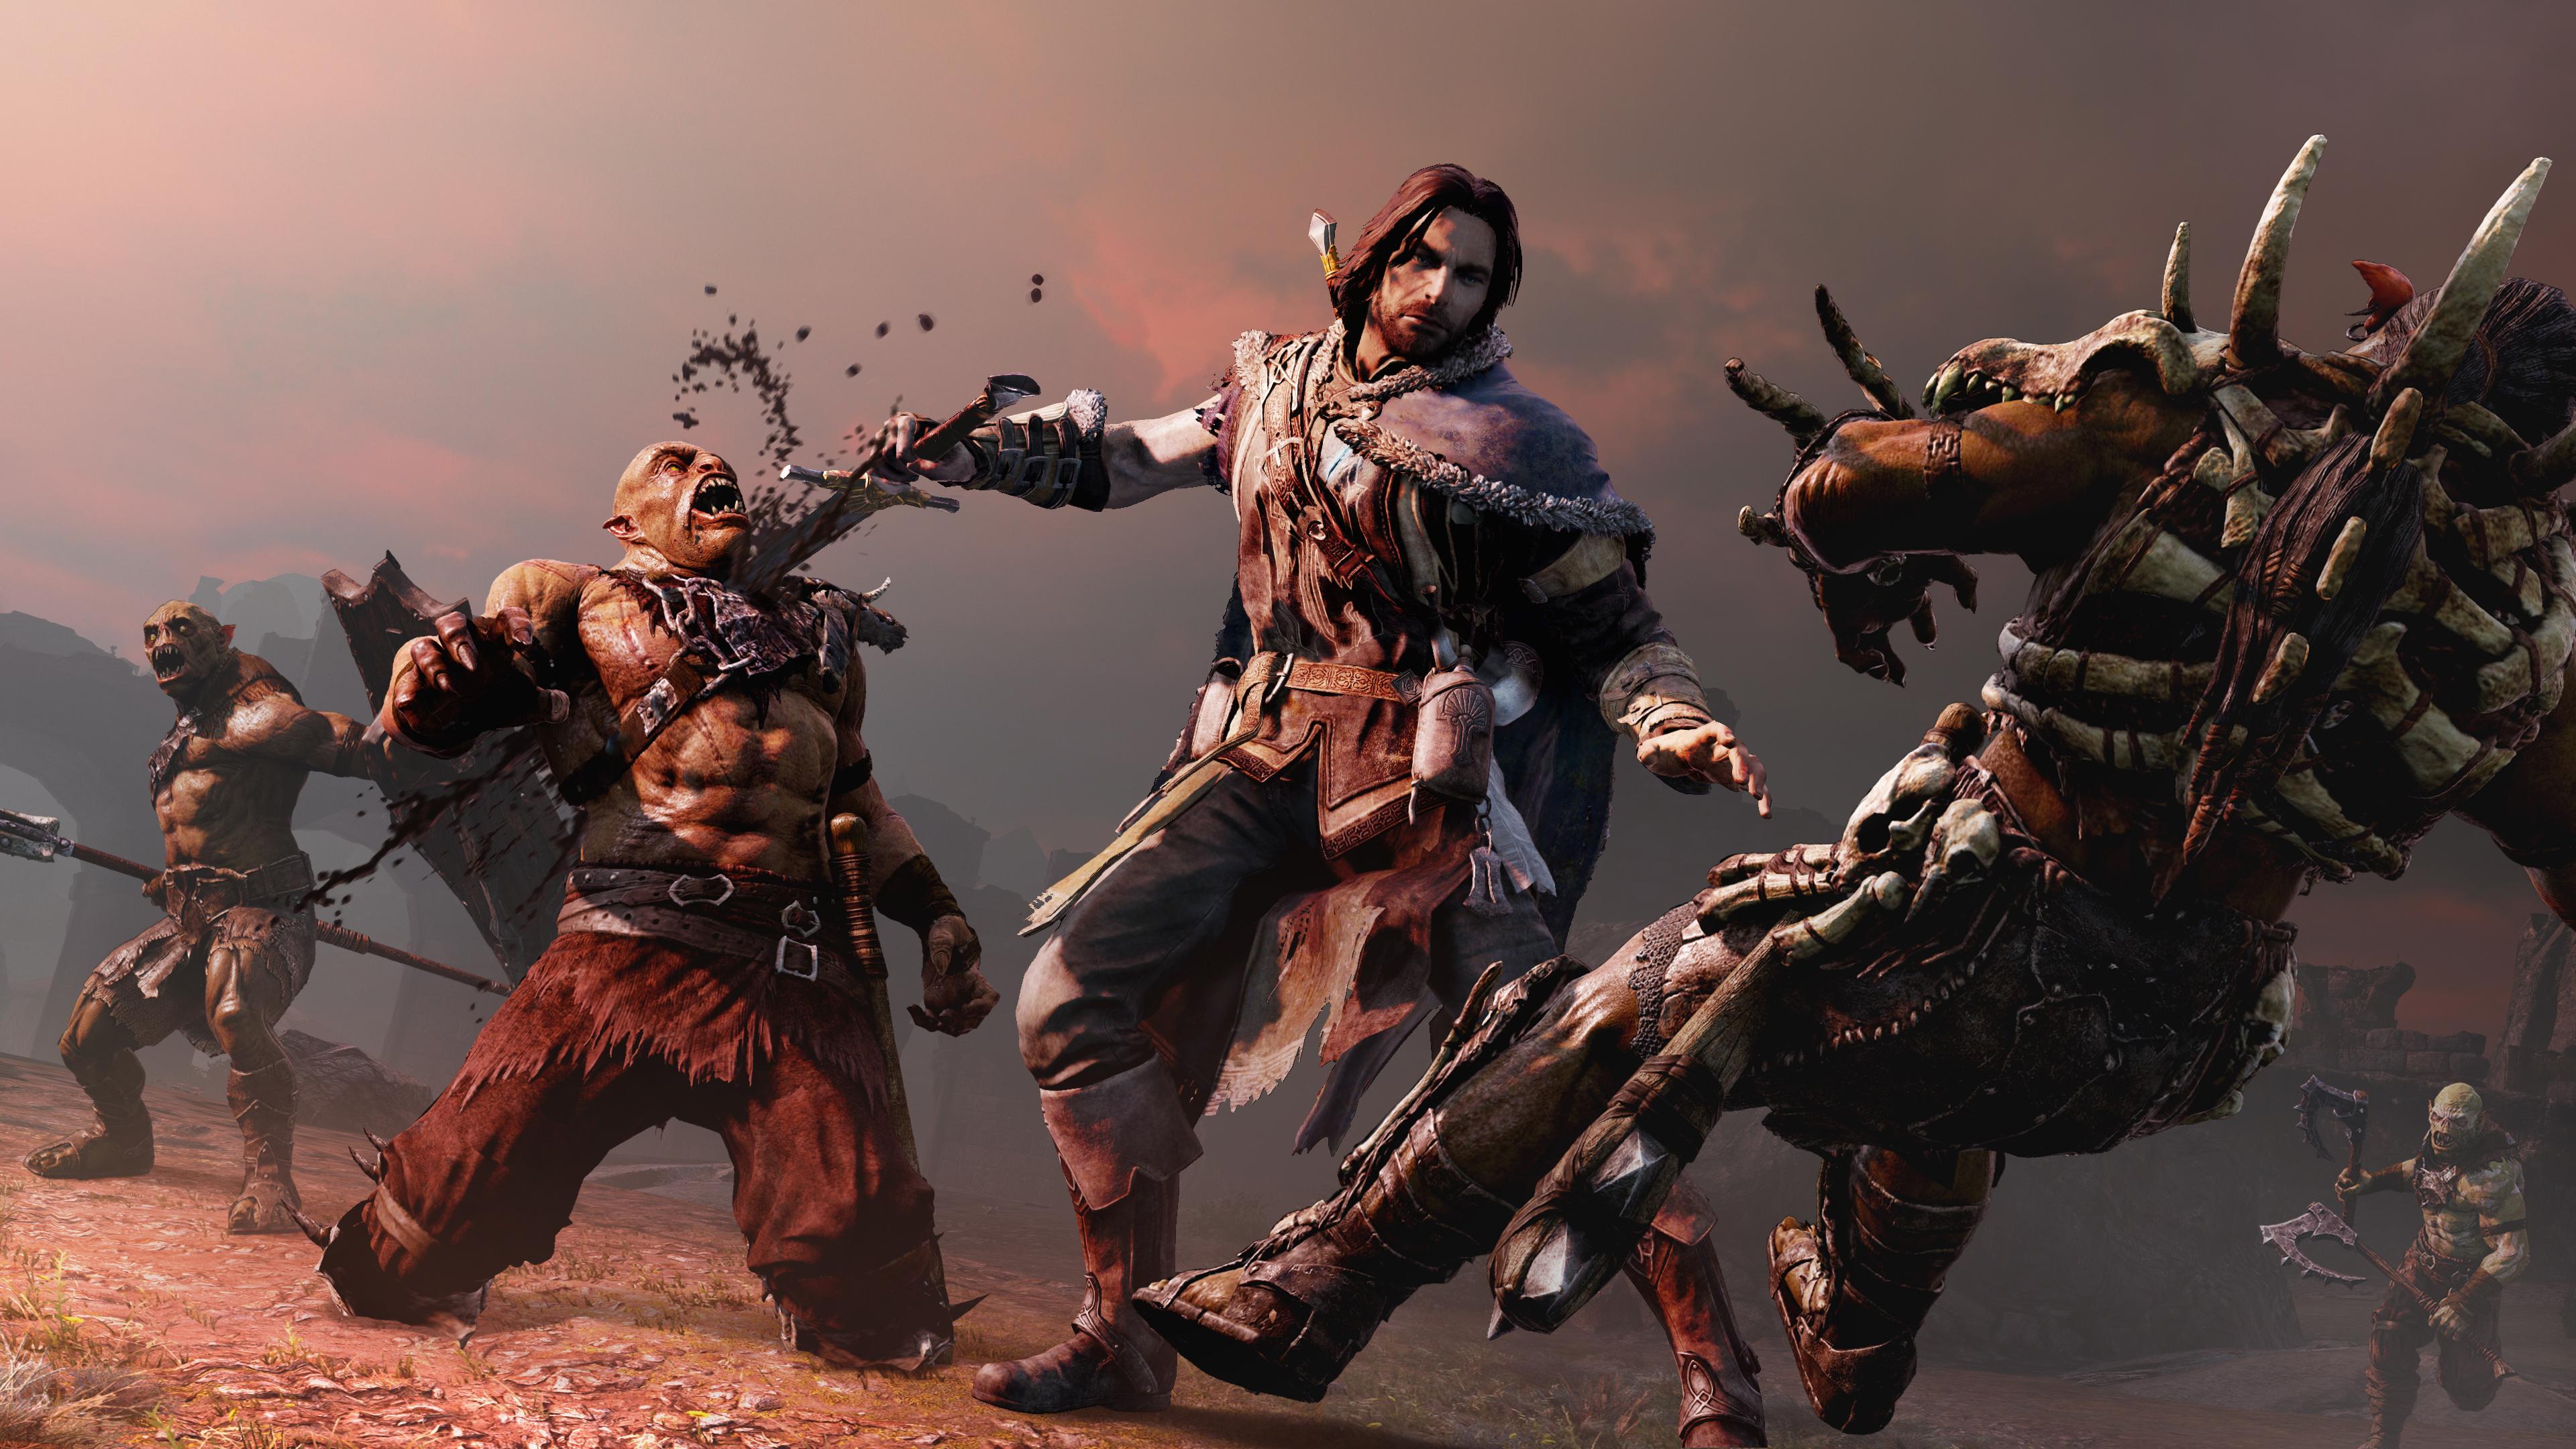 Middle earth: Shadow of Mordor obrázok z hry